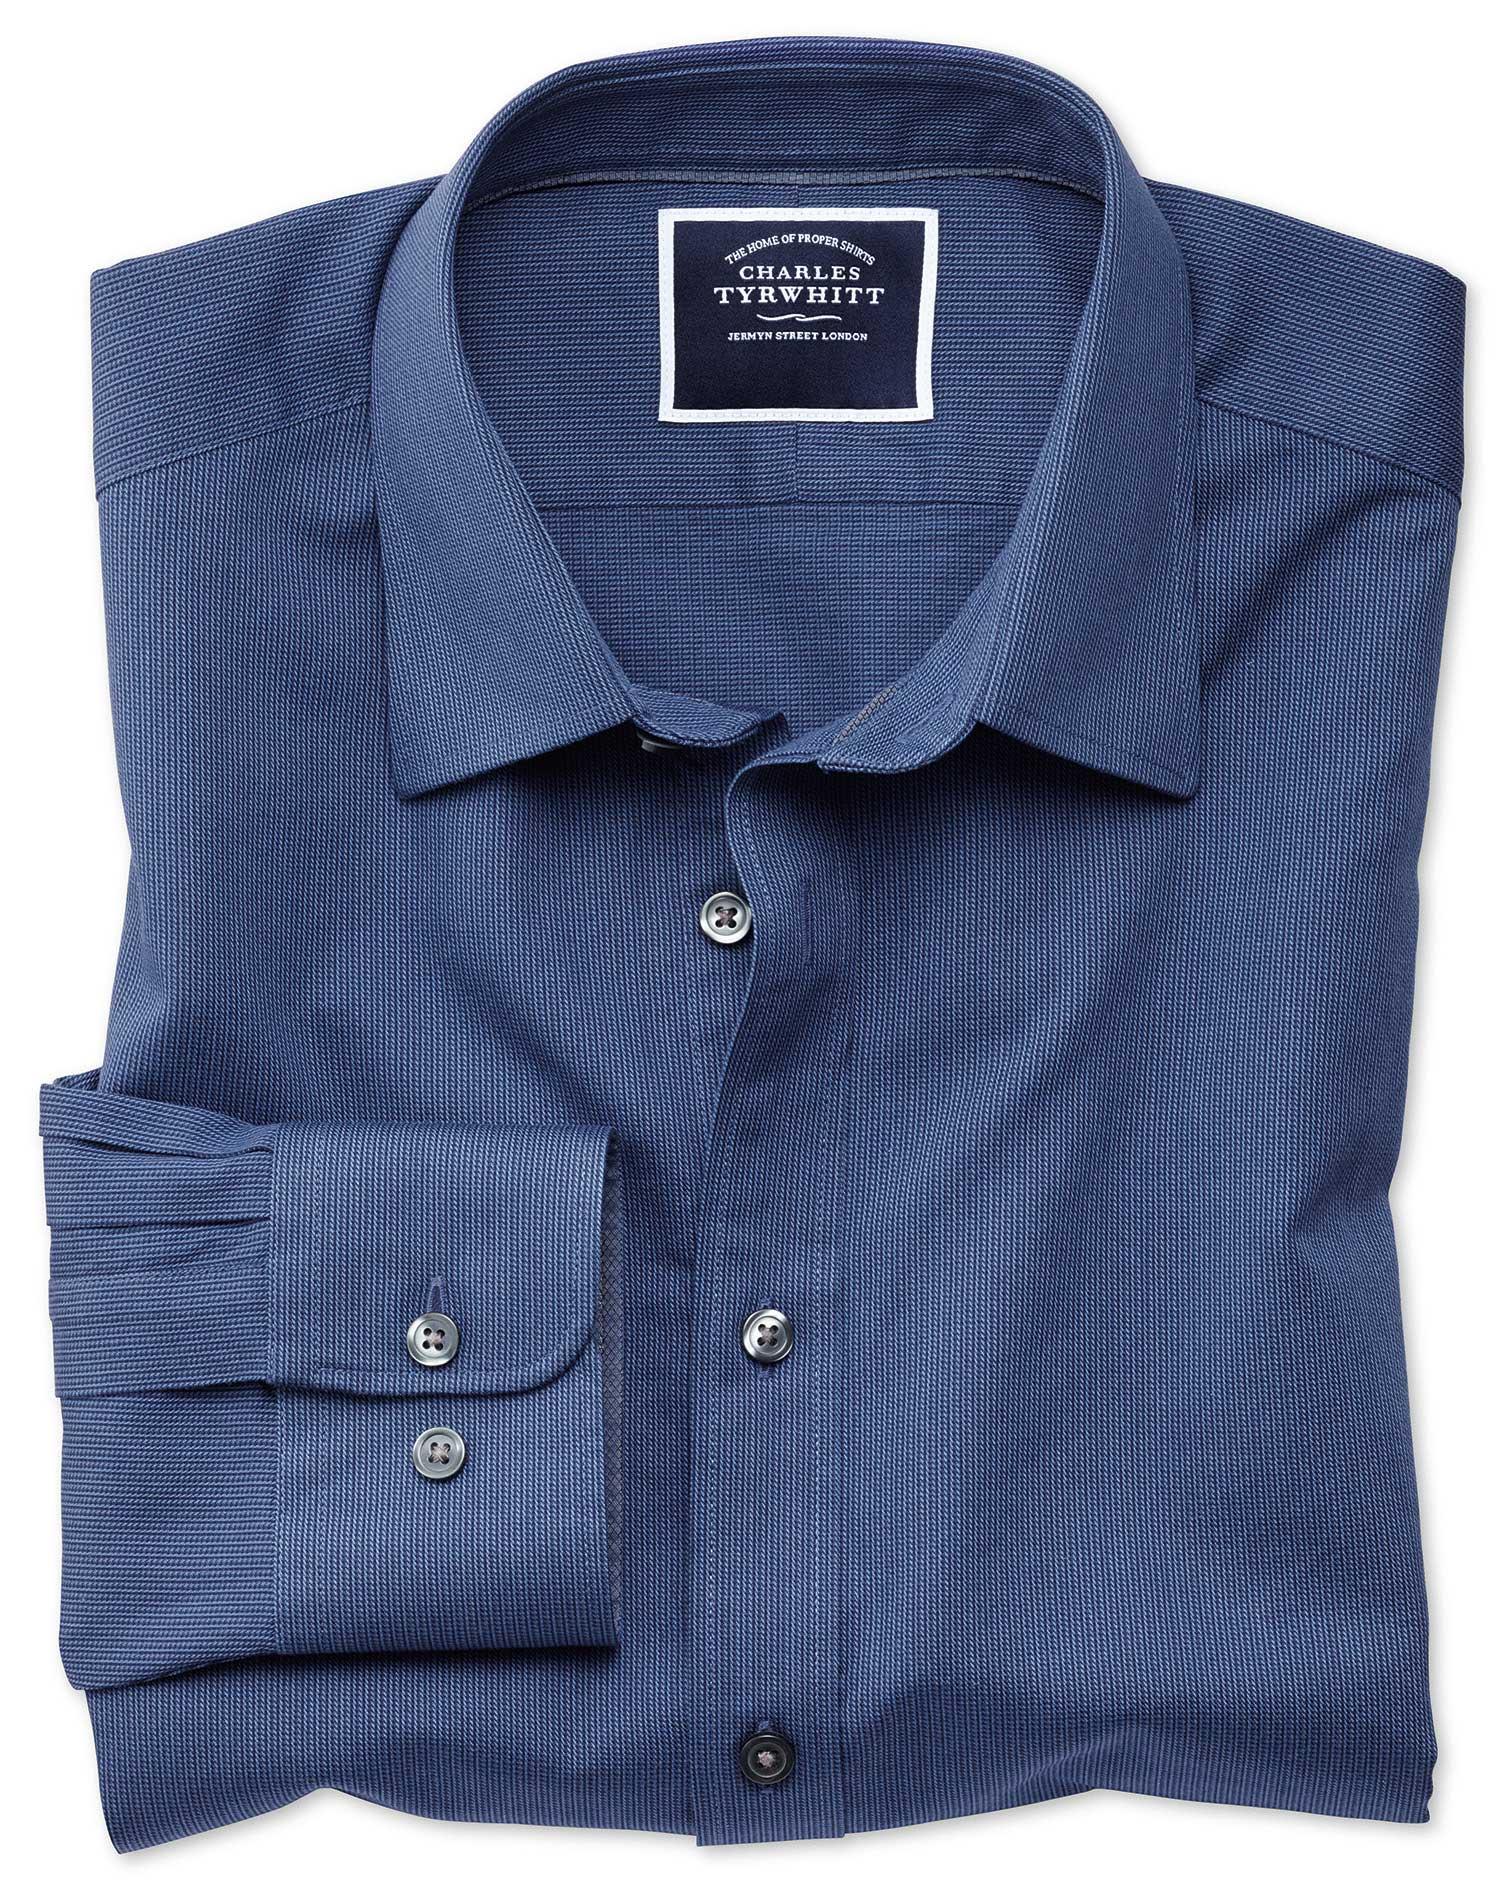 Extra Slim Fit Royal Blue Soft Textured Cotton Shirt Single Cuff Size XL by Charles Tyrwhitt